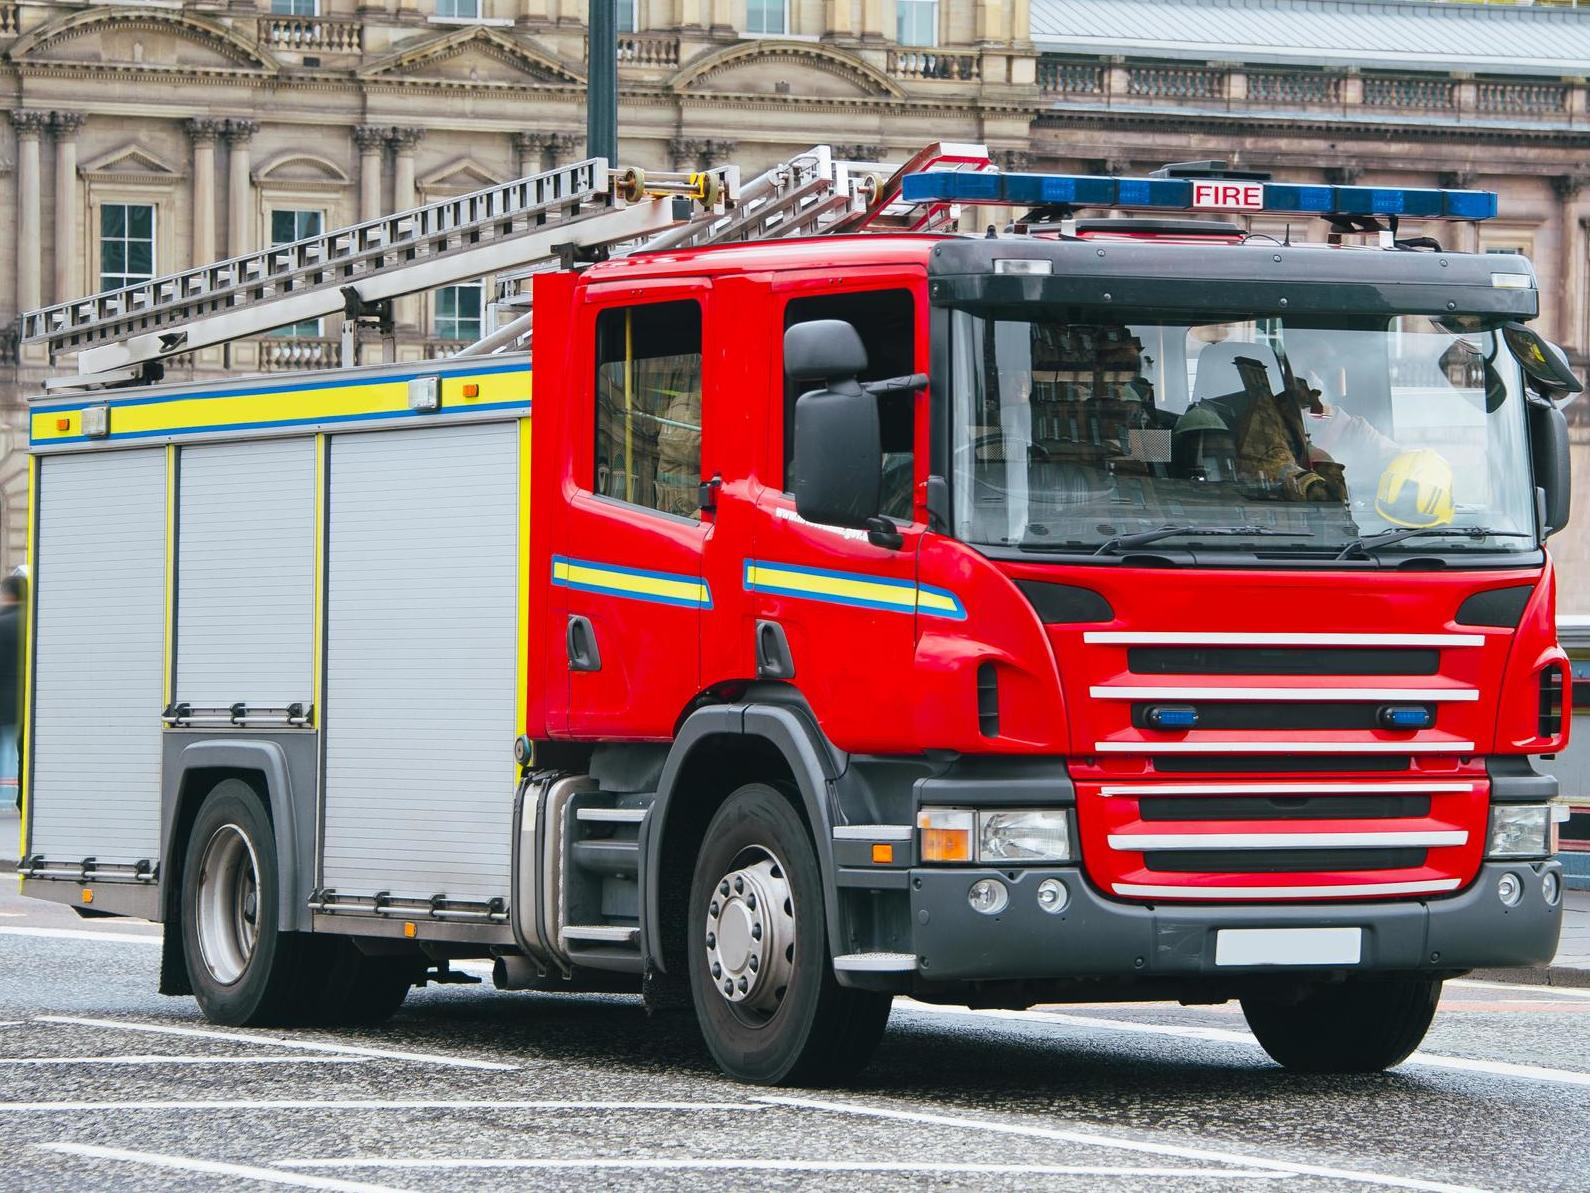 Fire service drops Fireman Sam mascot following inclusivity complaints